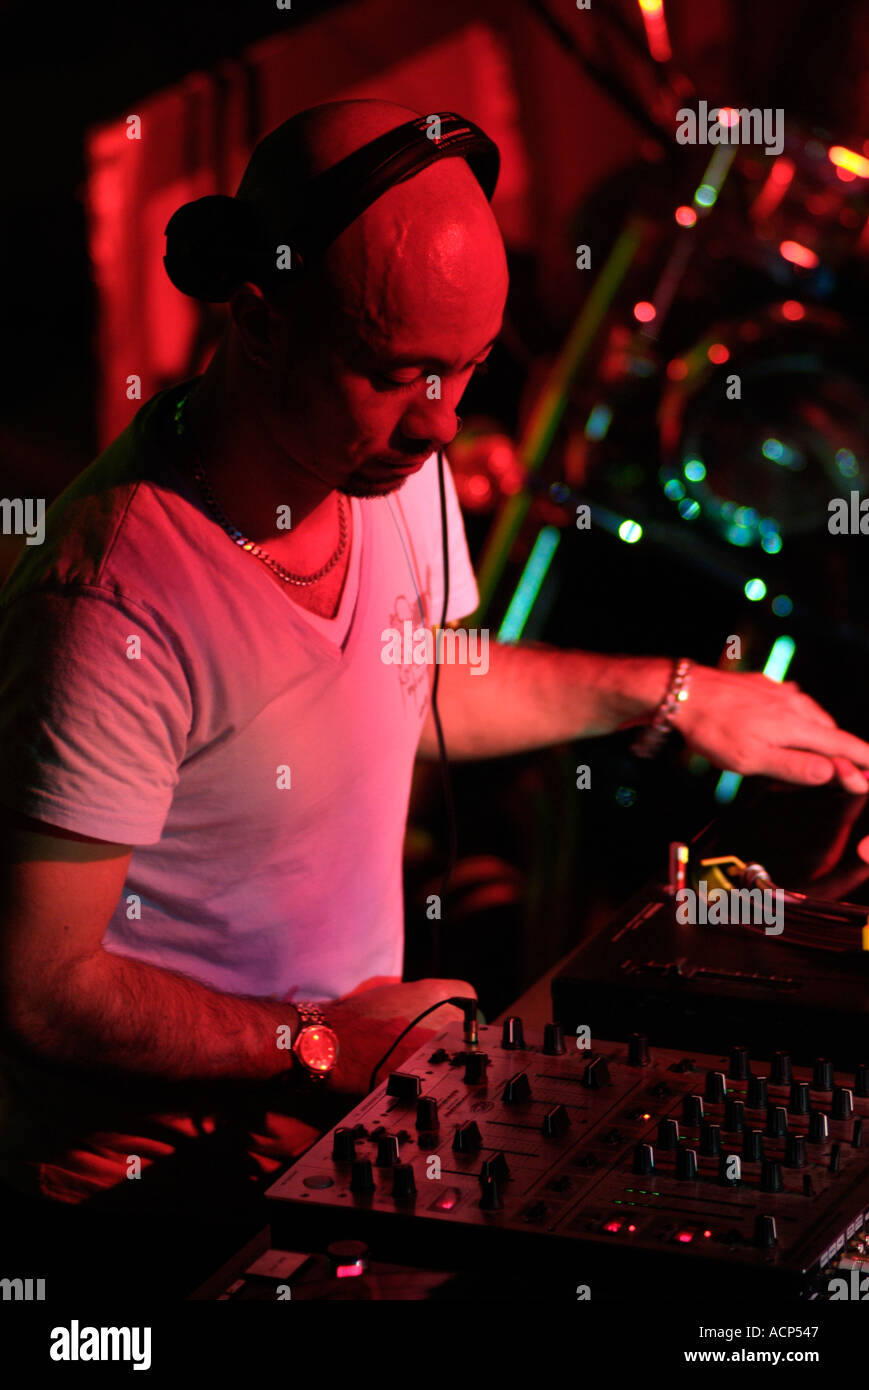 Club DJ Behind the Decks at a Nightclub - Stock Image